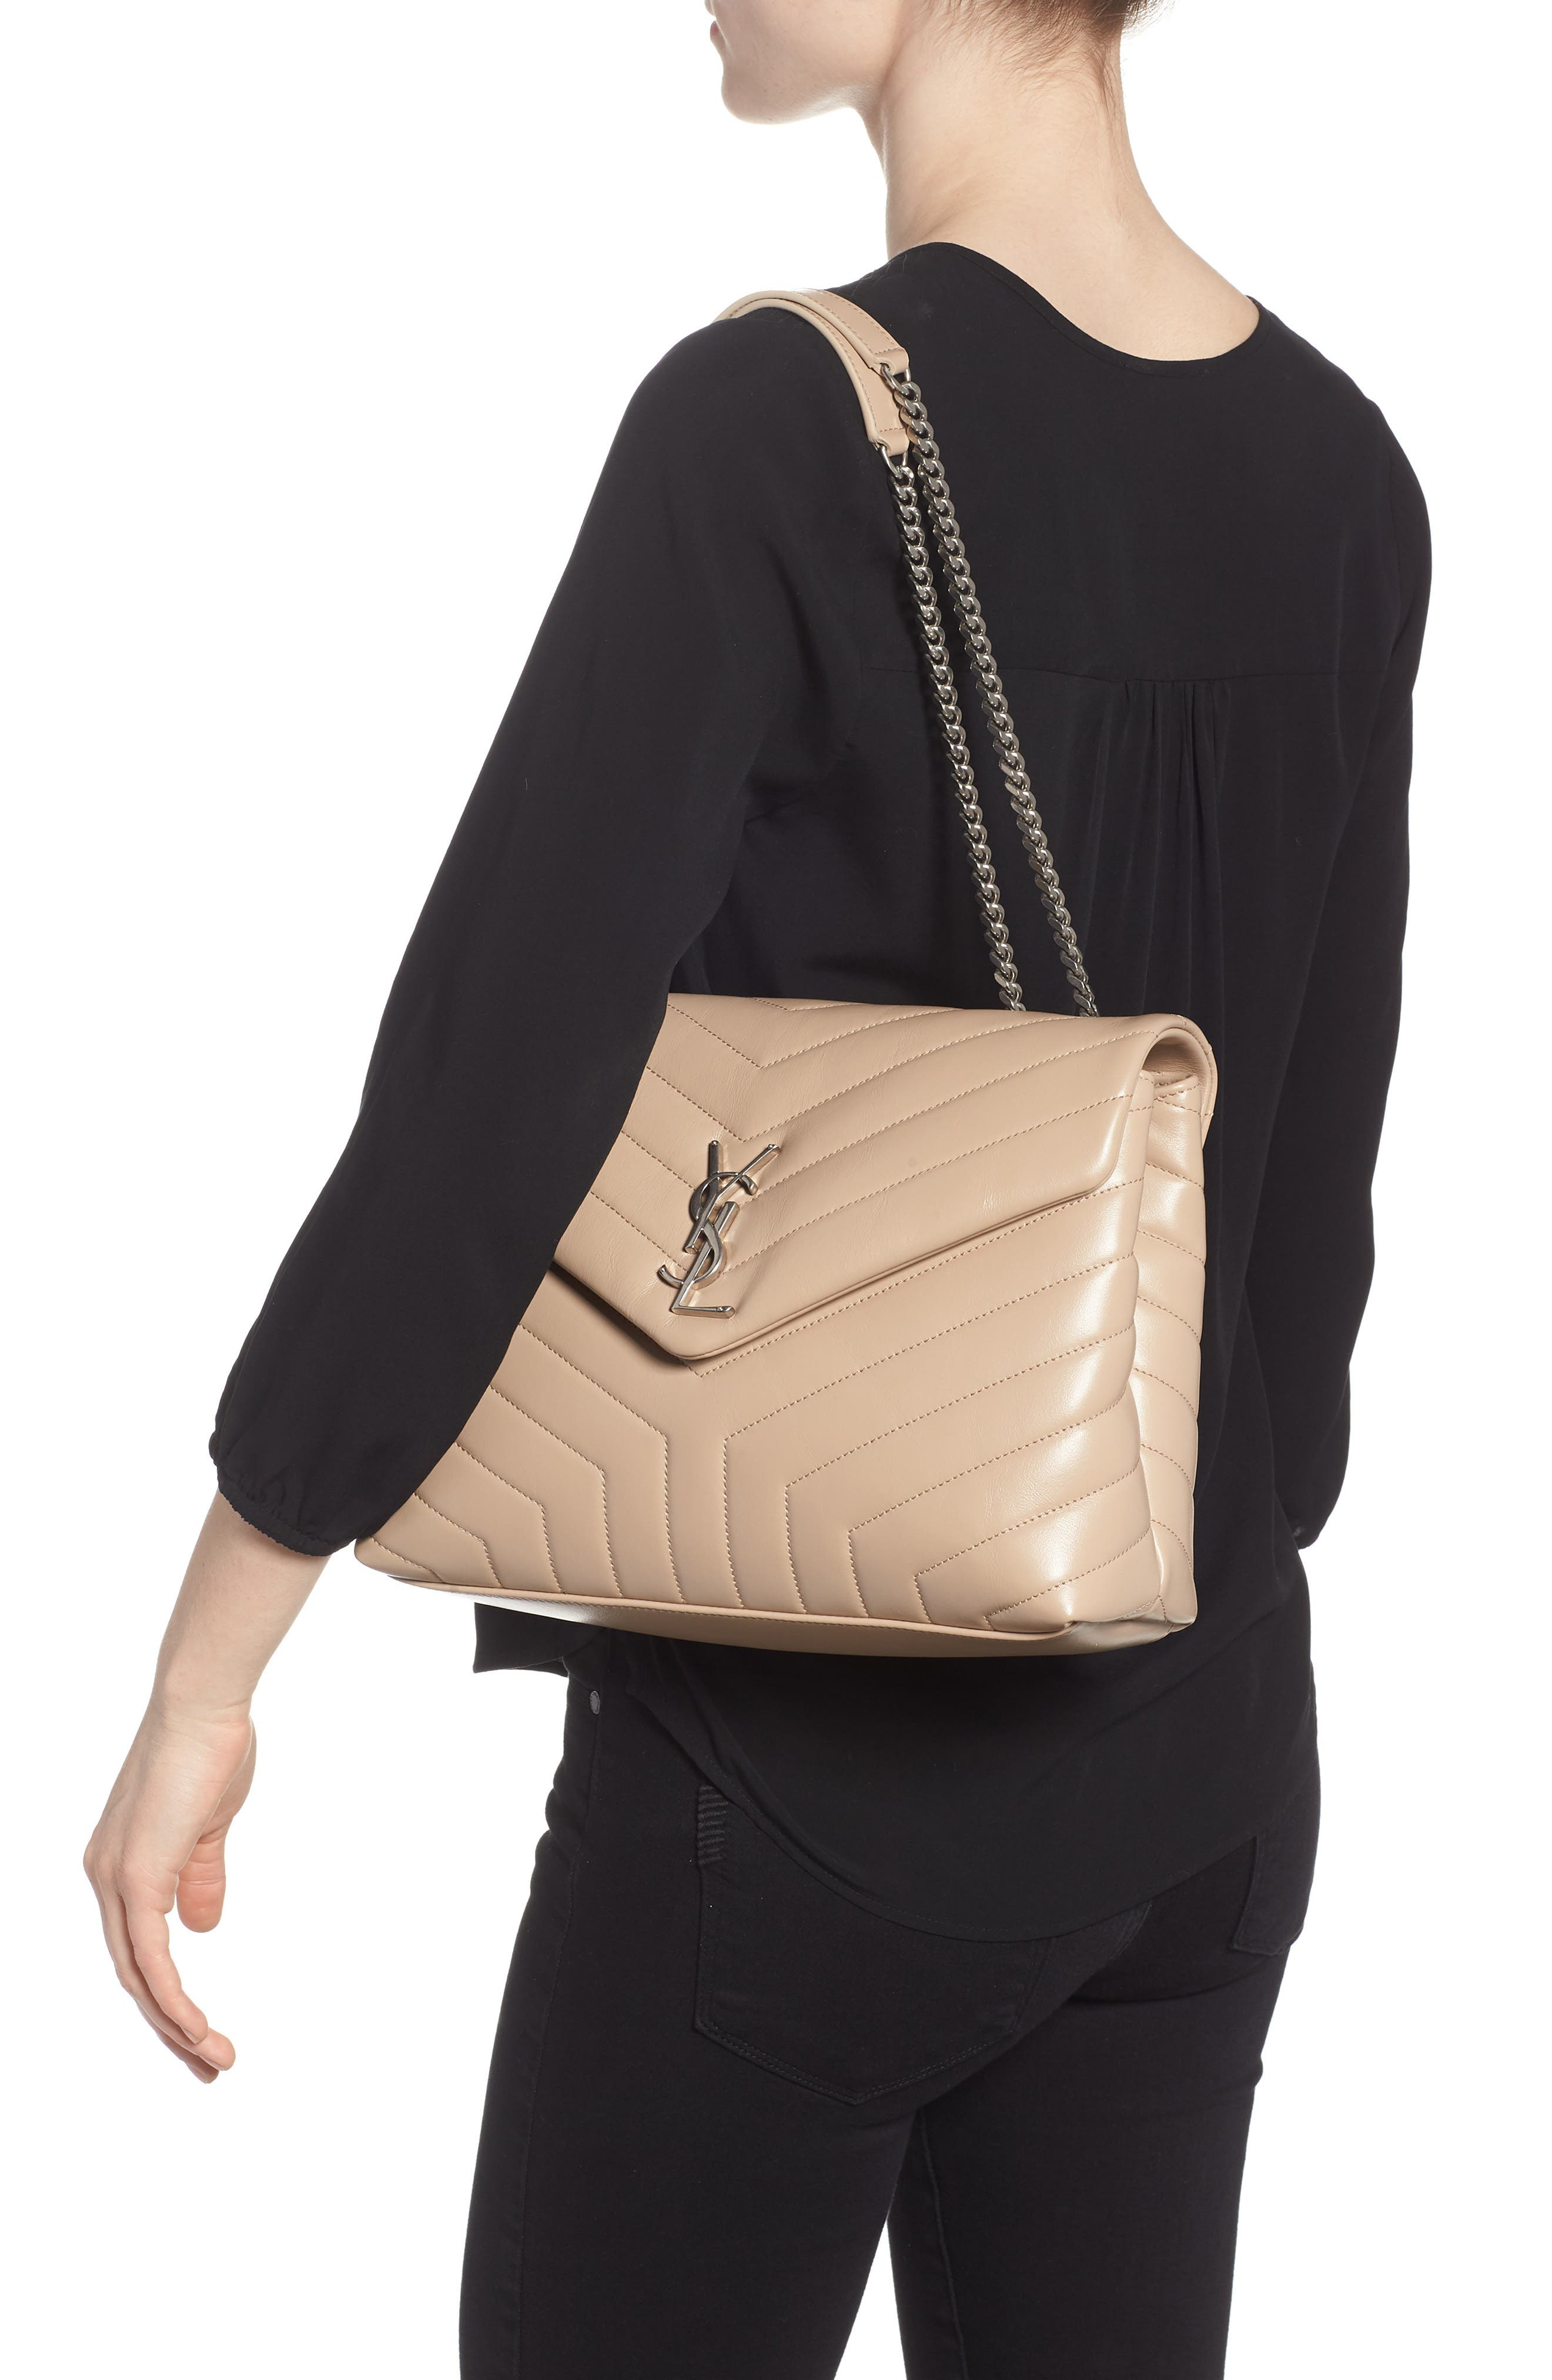 Medium Loulou Matelassé Calfskin Leather Shoulder Bag,                             Alternate thumbnail 2, color,                             LIGHT NATURAL